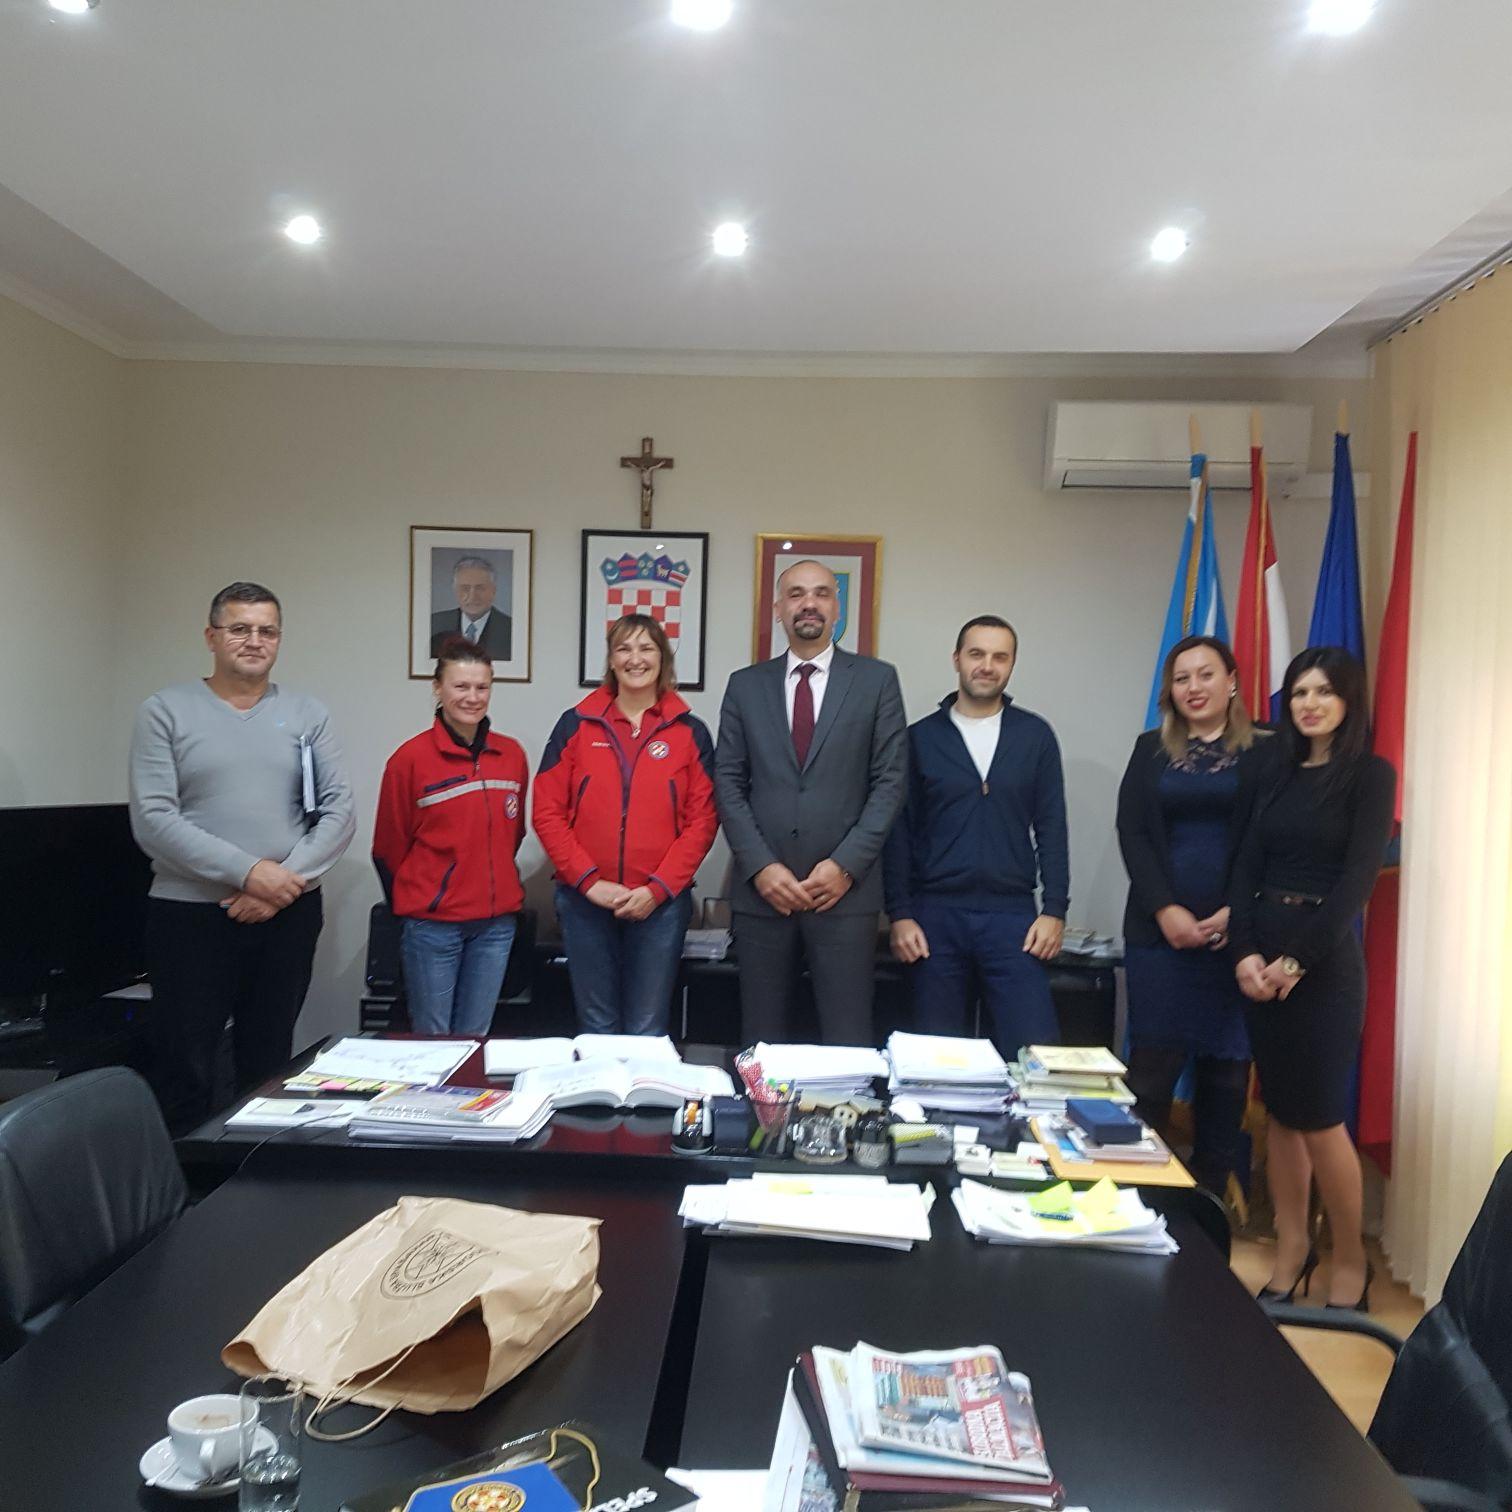 Hrvatska Gorska Služba Spašavanja – Stanica Šibenik  posjetila Grad Knin